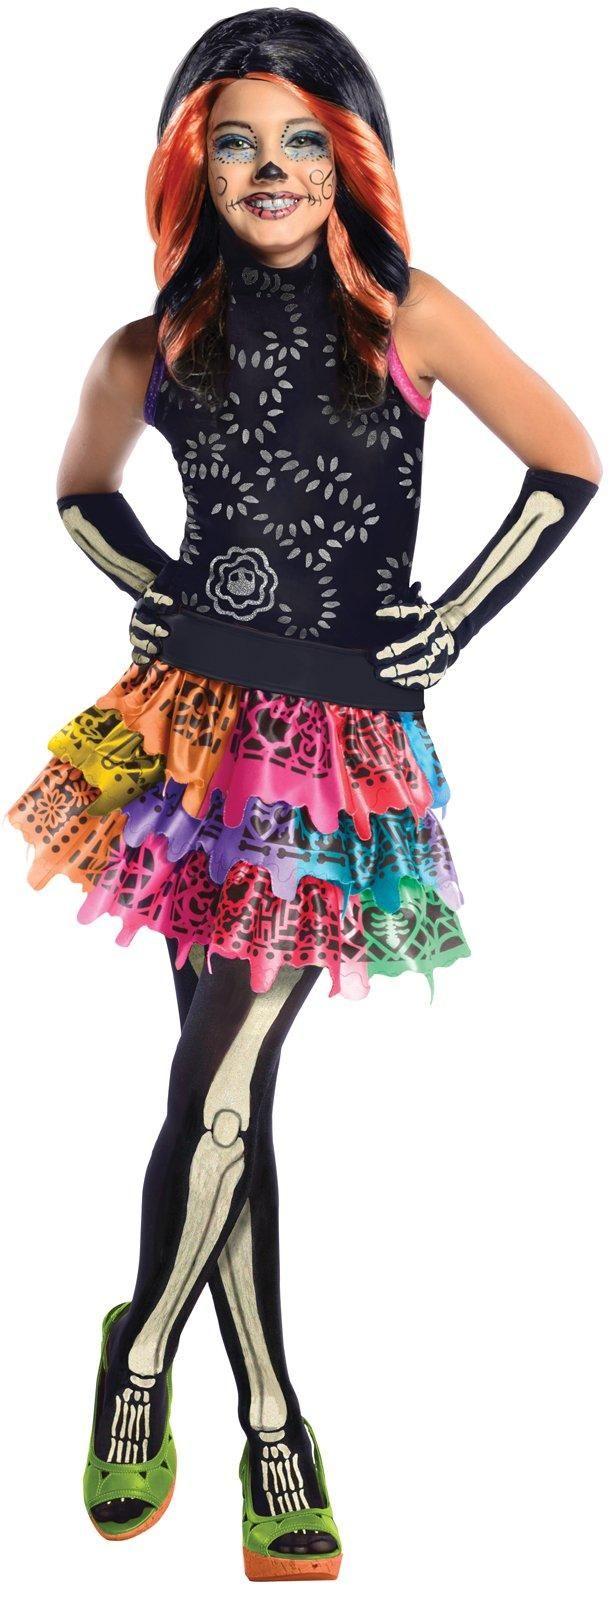 Monster High Skelita Calaveras Child Costume from BirthdayExpress.com